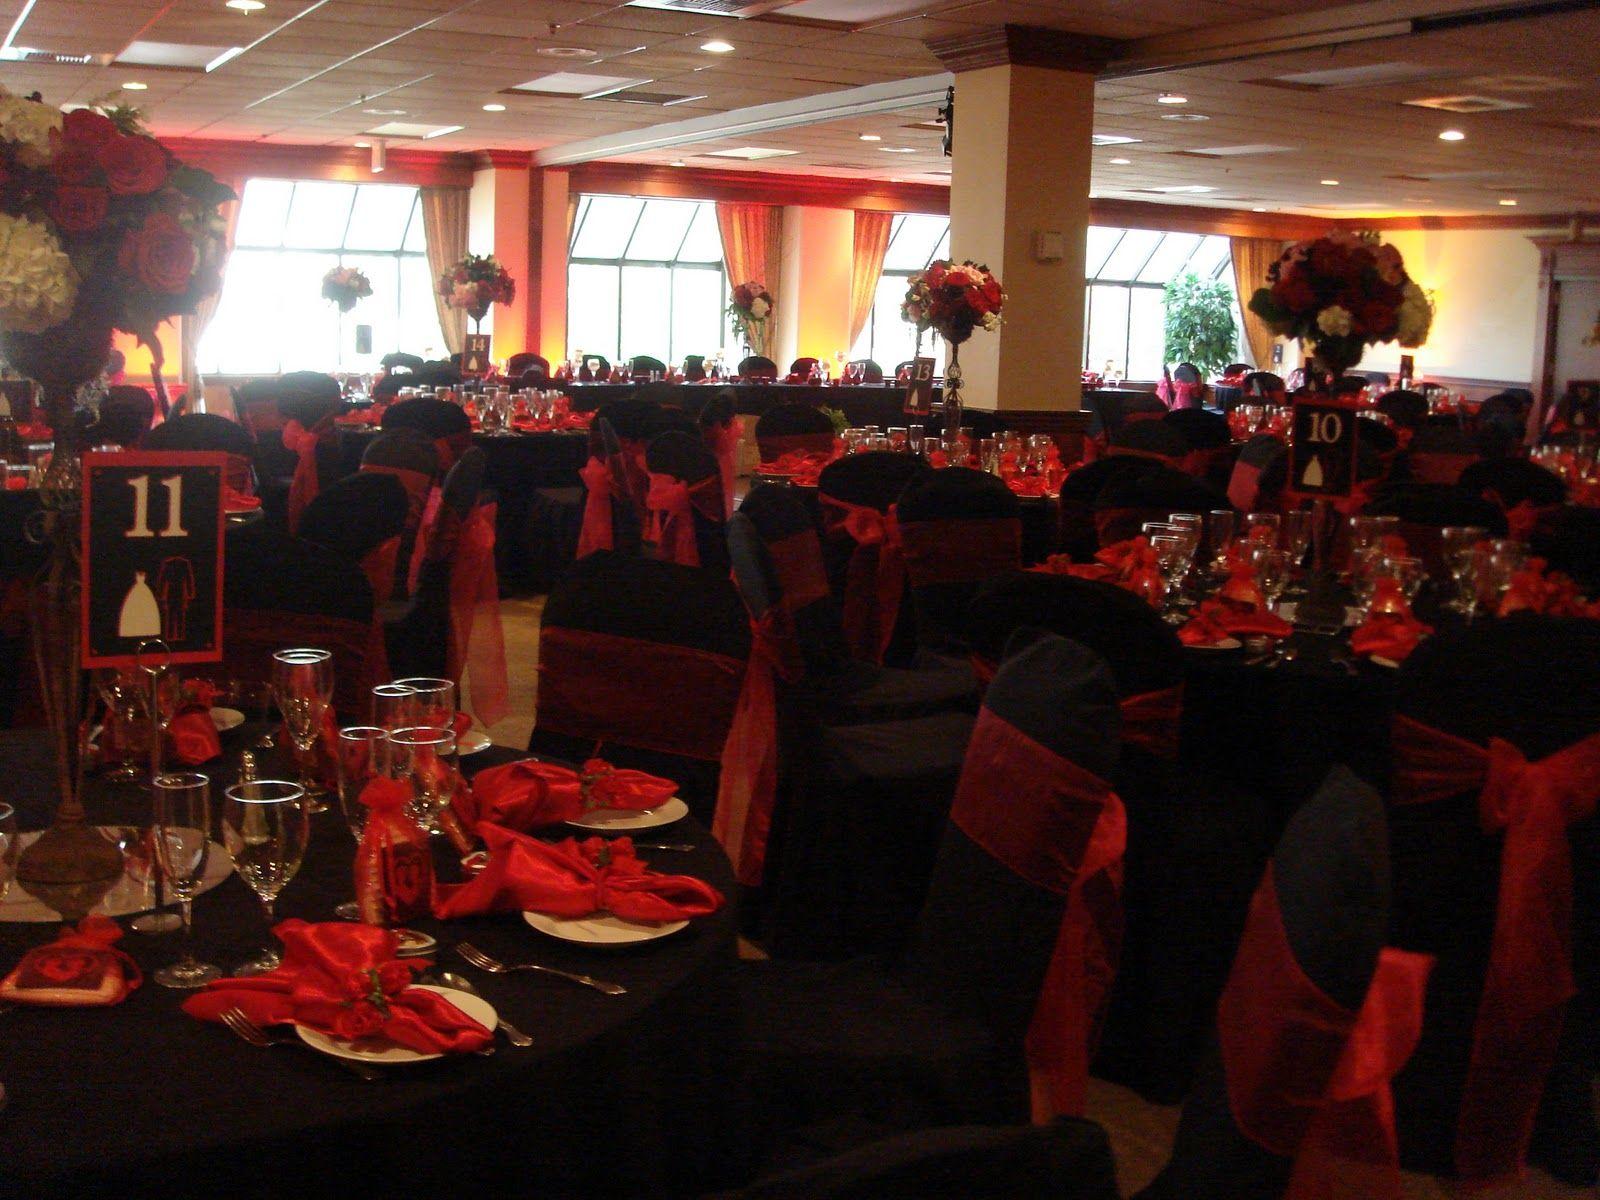 Unique red and black wedding reception ideas with chair covers unique red and black wedding reception ideas with chair covers napkins in black and chili santanas junglespirit Images